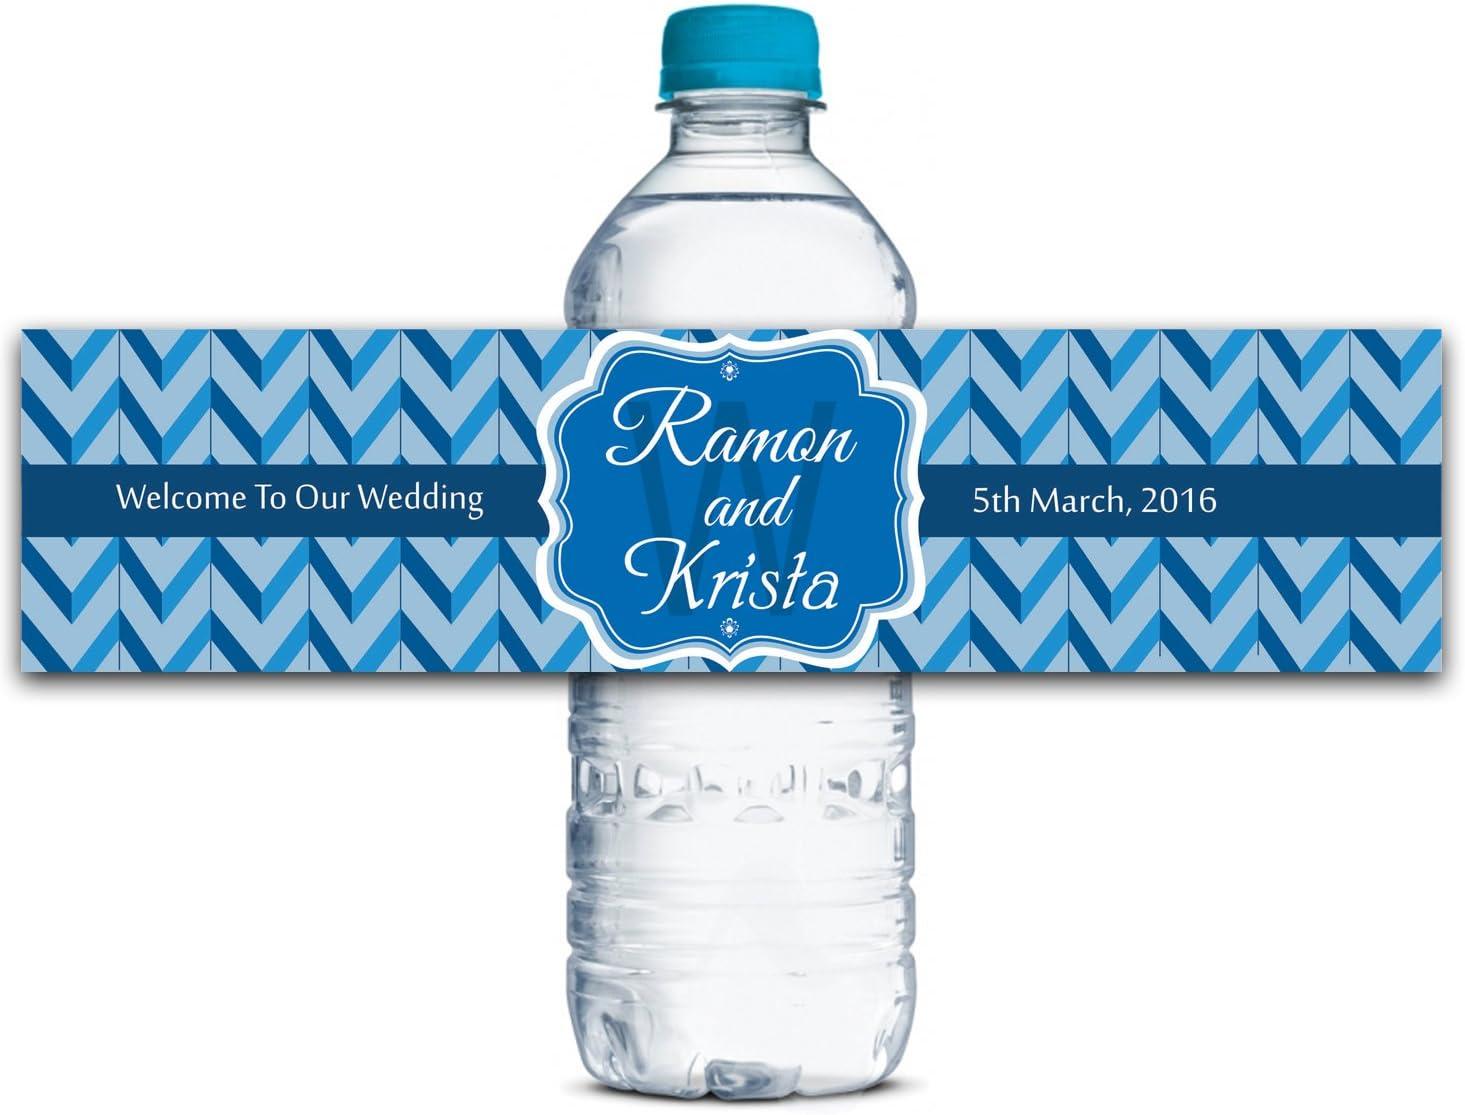 Wedding Water Bottle Labels Wedding Invites Labels  WBL108P Personalized Labels Custom Water Bottle Labels Self Adhesive Labels